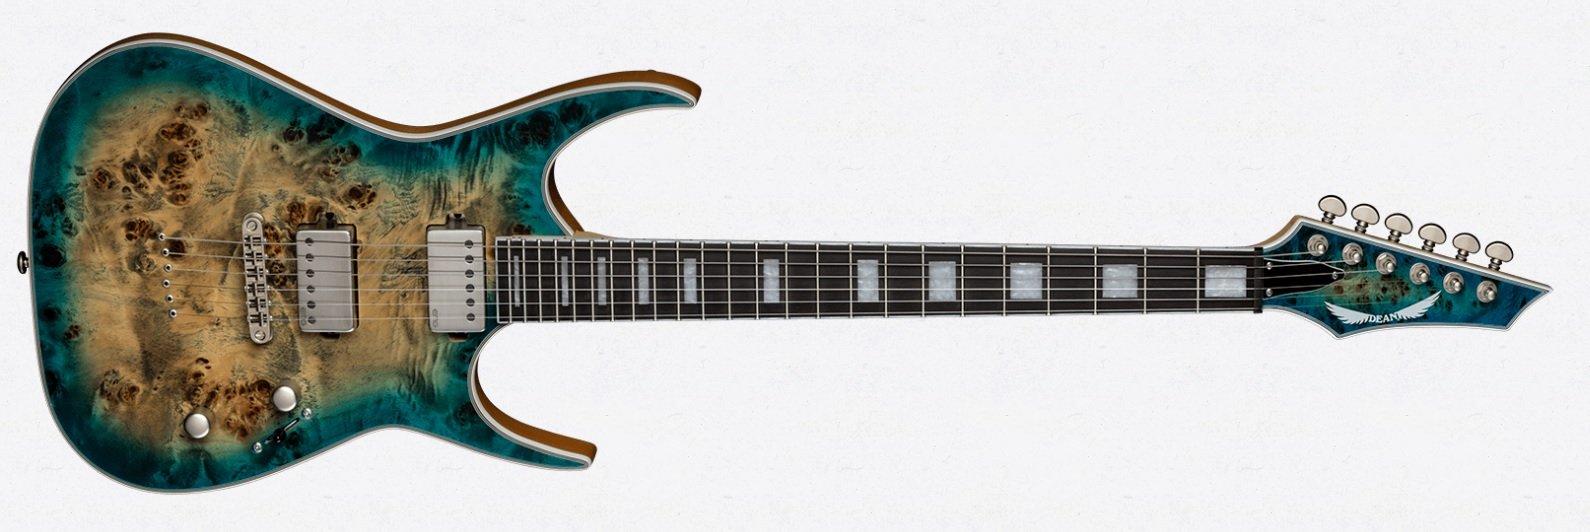 Dean Exile Select Electric Guitar - Burled Poplar - Satin Turquoise Burst